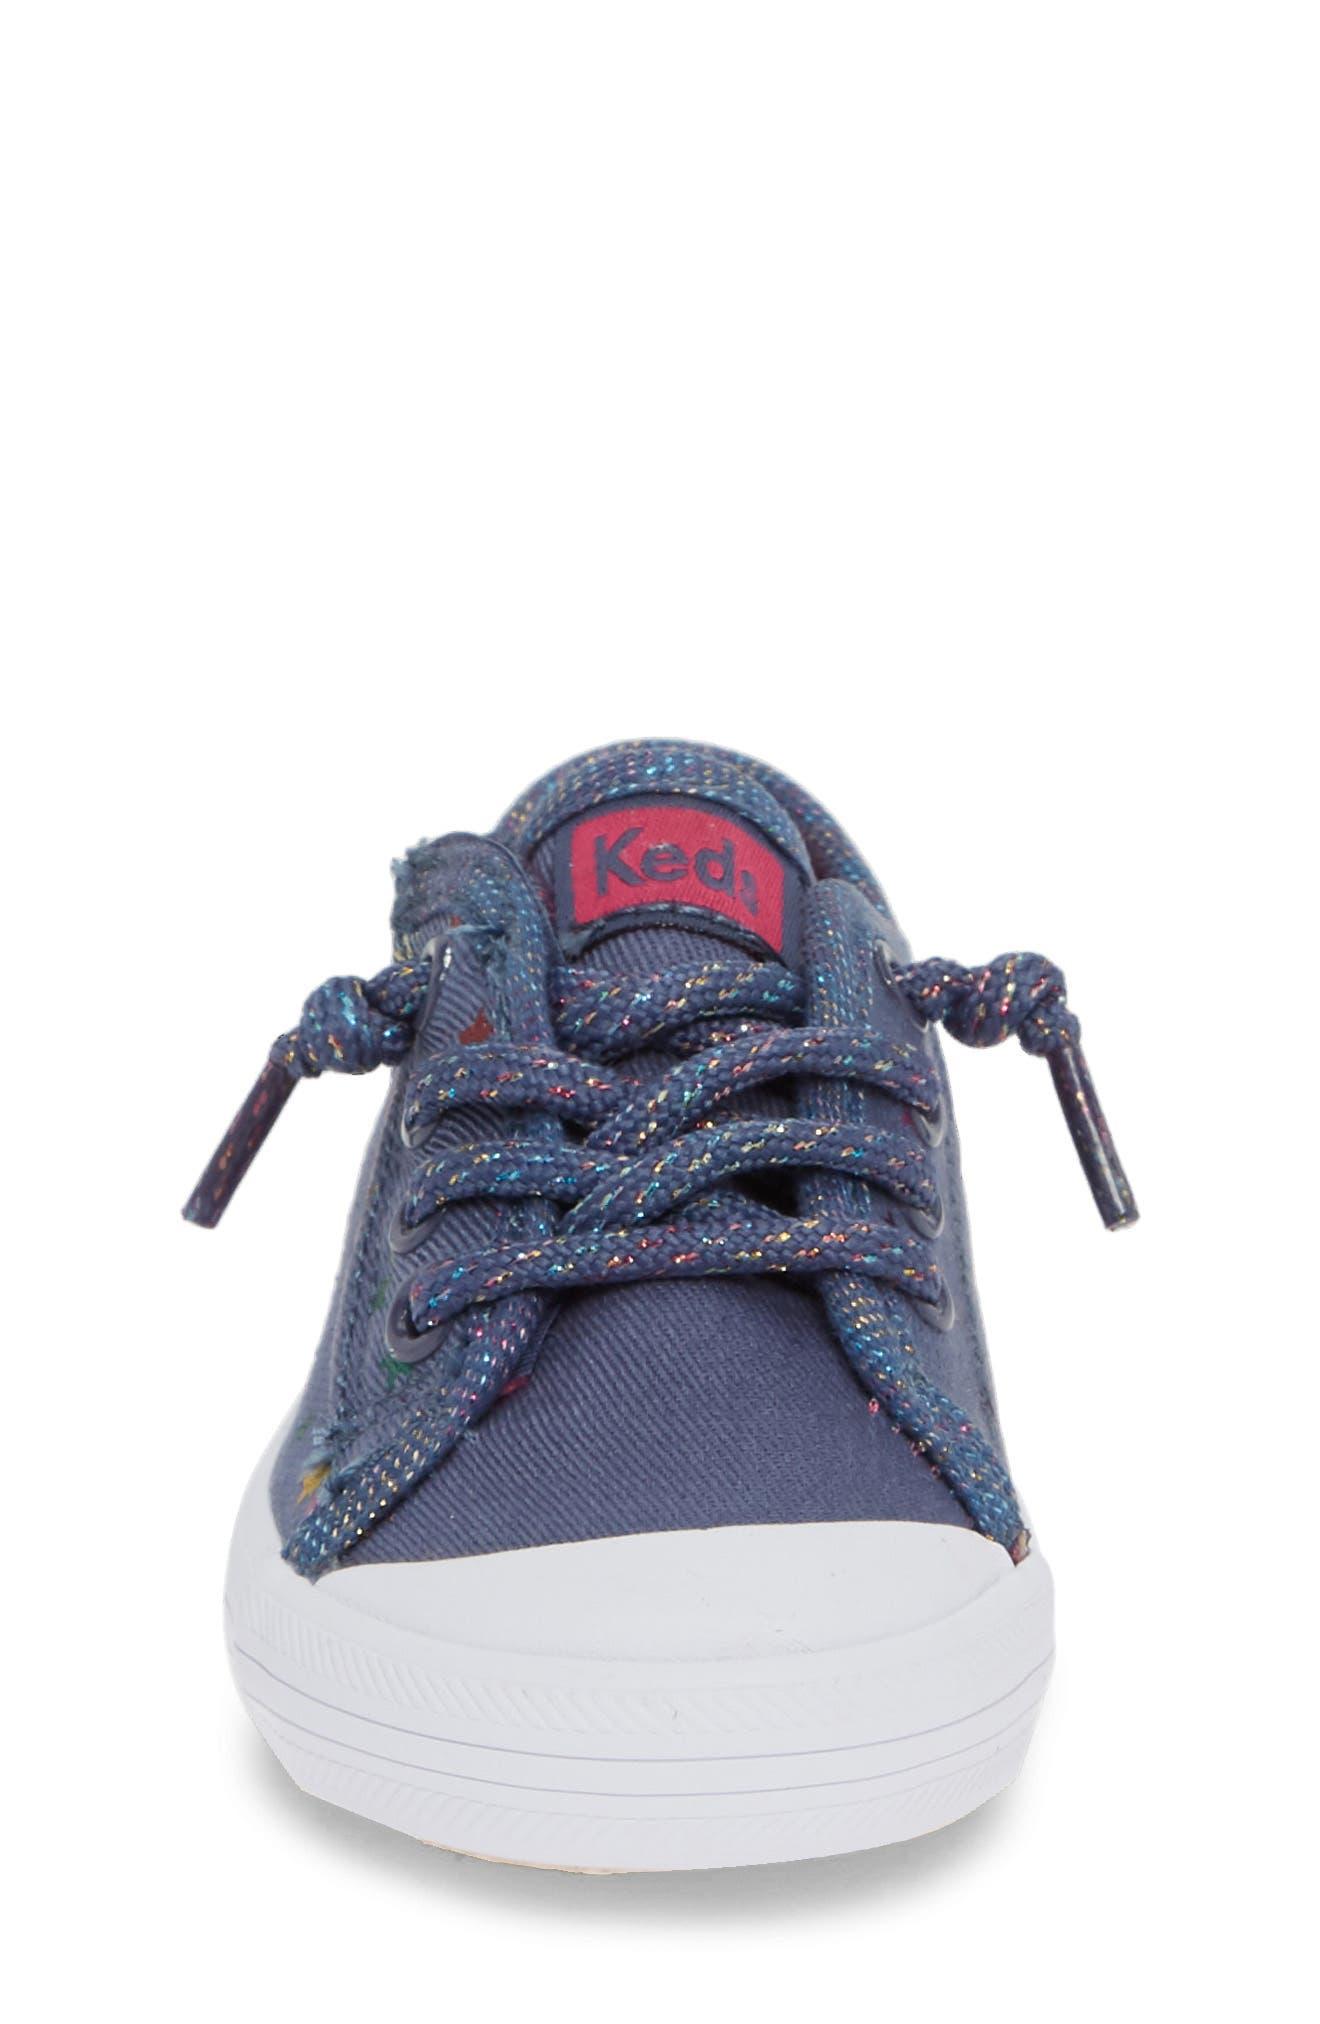 KEDS<SUP>®</SUP>, Kickstart Cap Toe Sneaker, Alternate thumbnail 4, color, STAR PERF